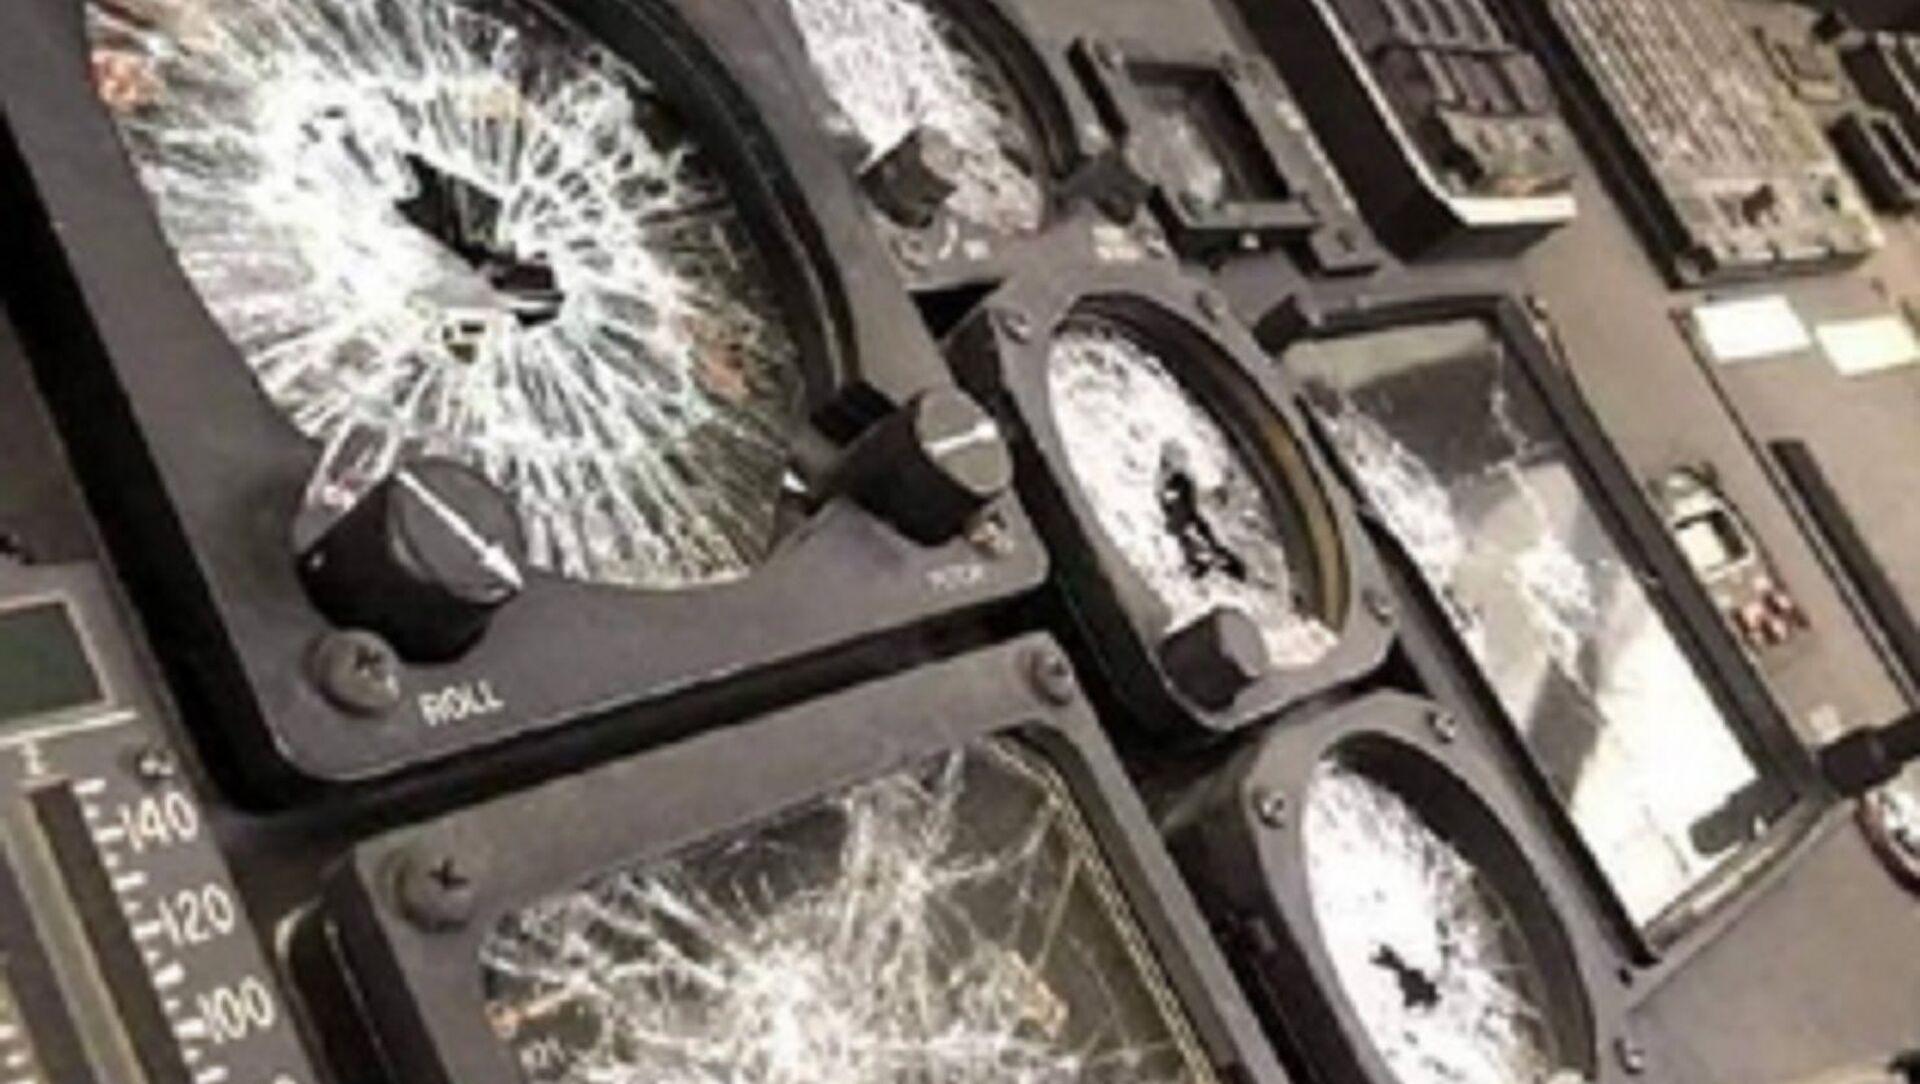 Damaged equipment left by US troops in Kabul Airport. - Sputnik International, 1920, 03.09.2021